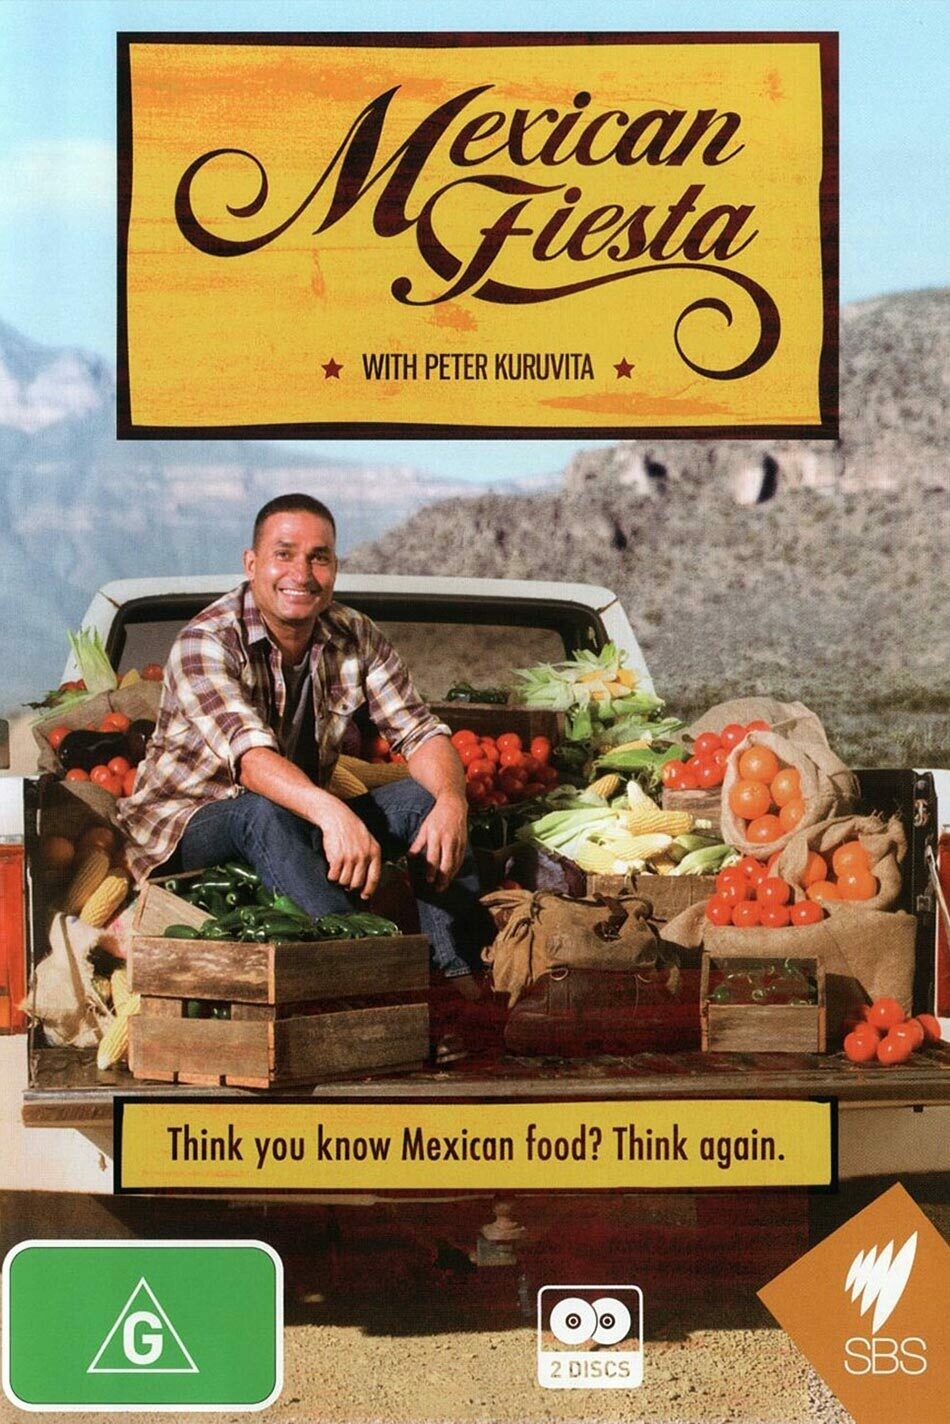 Mexican Fiesta with Peter Kuruvita